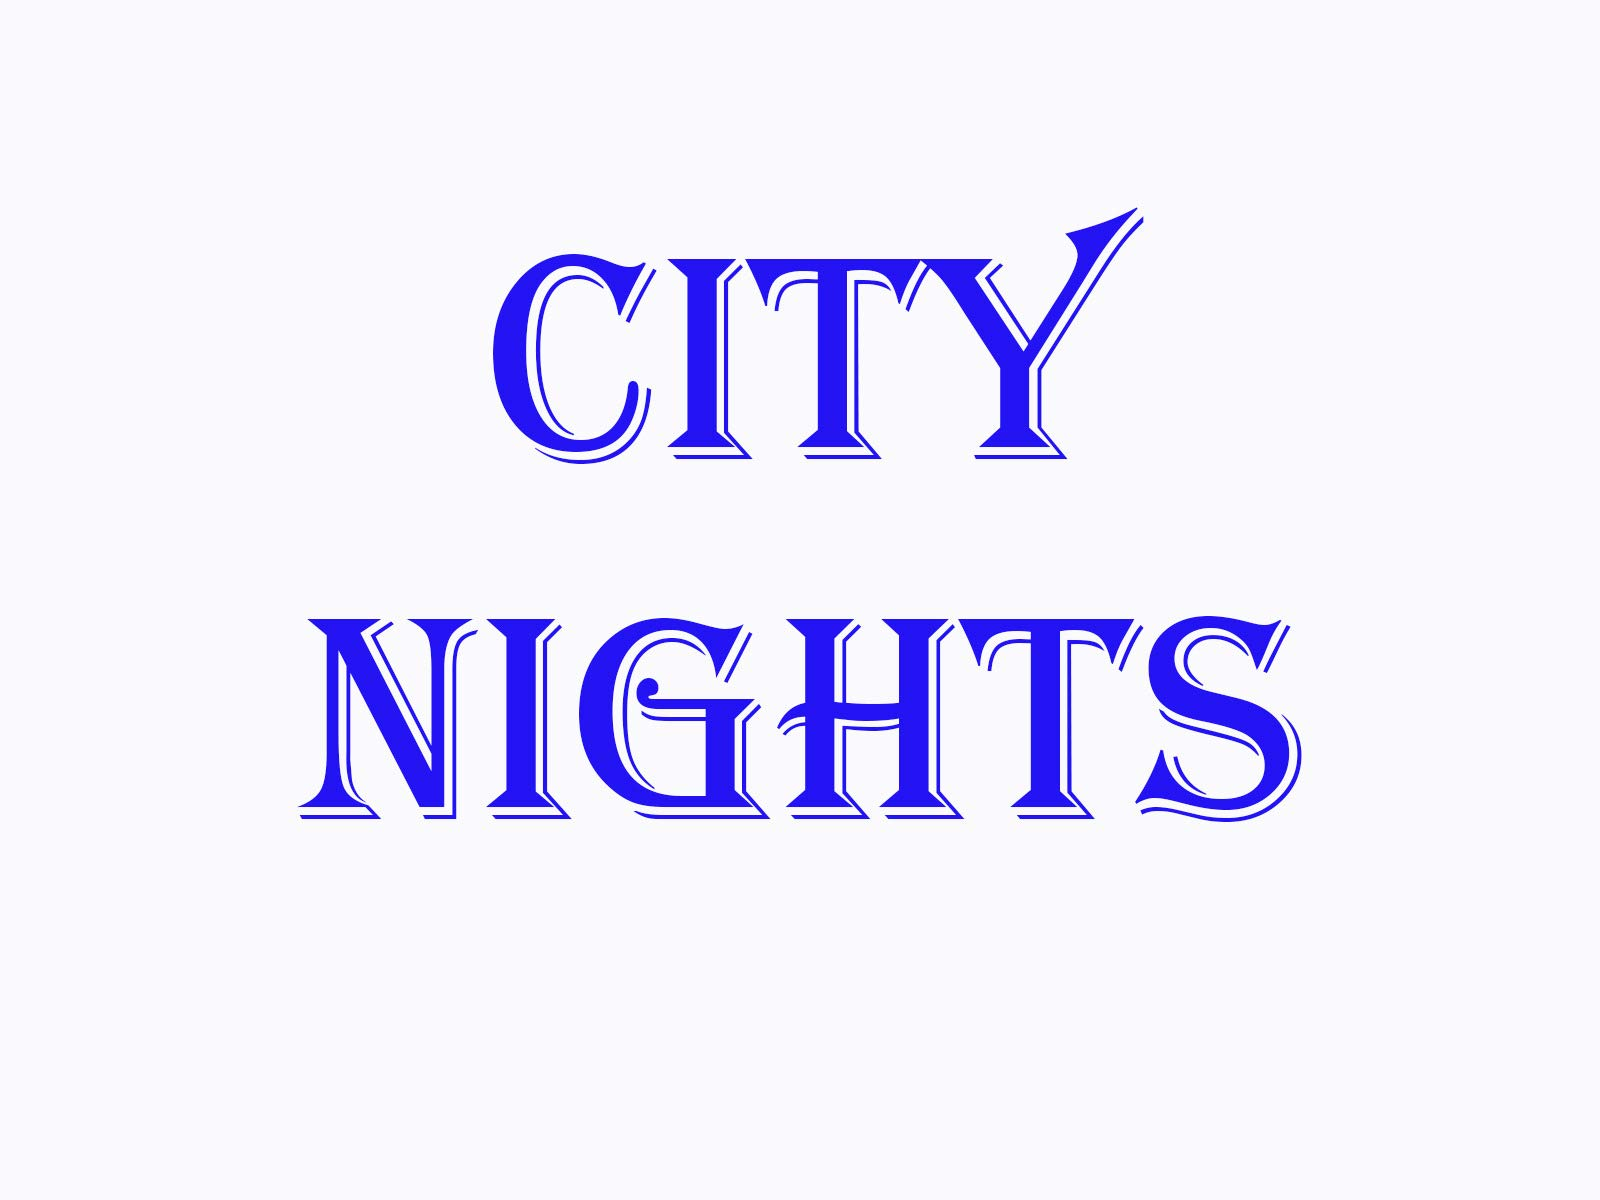 City Nights - Season 2